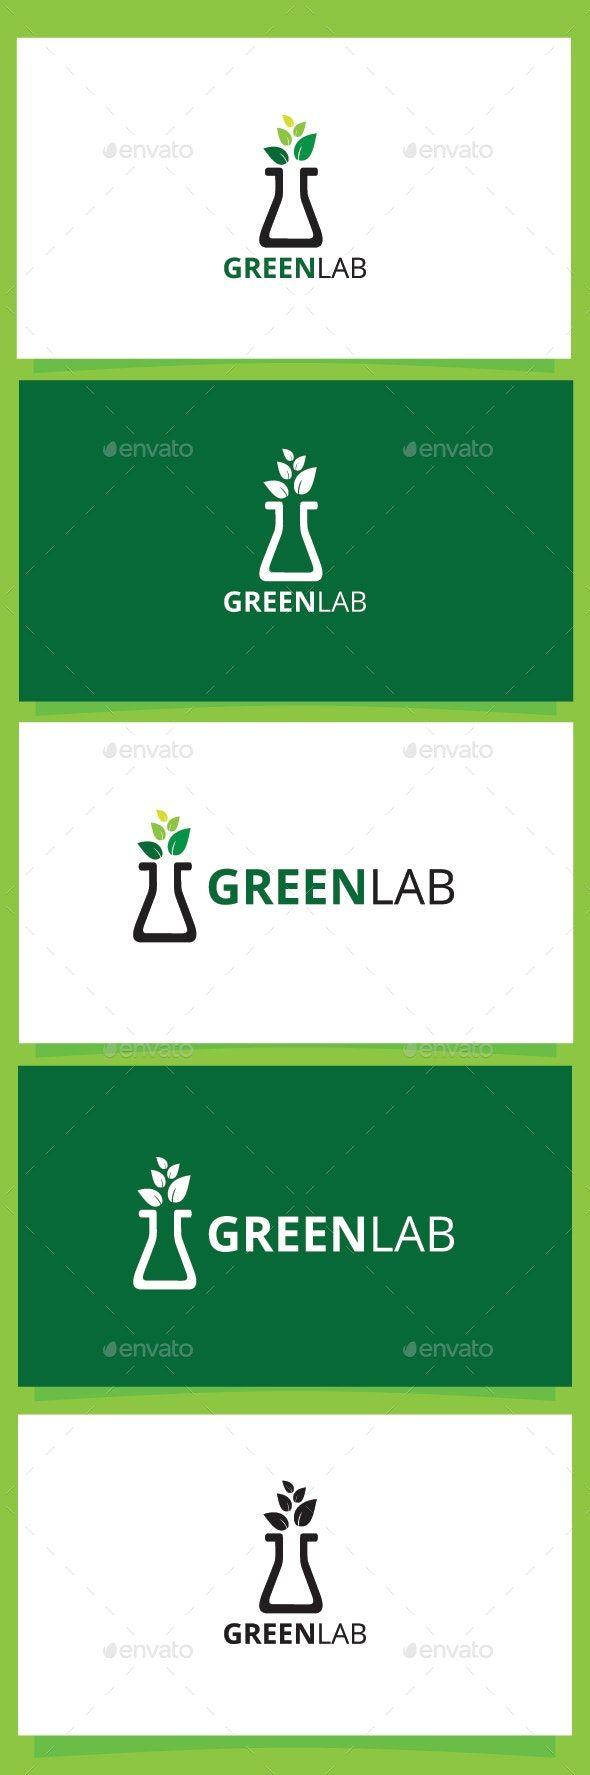 Greenlab | Simple logo, Logo templates, Logo design template